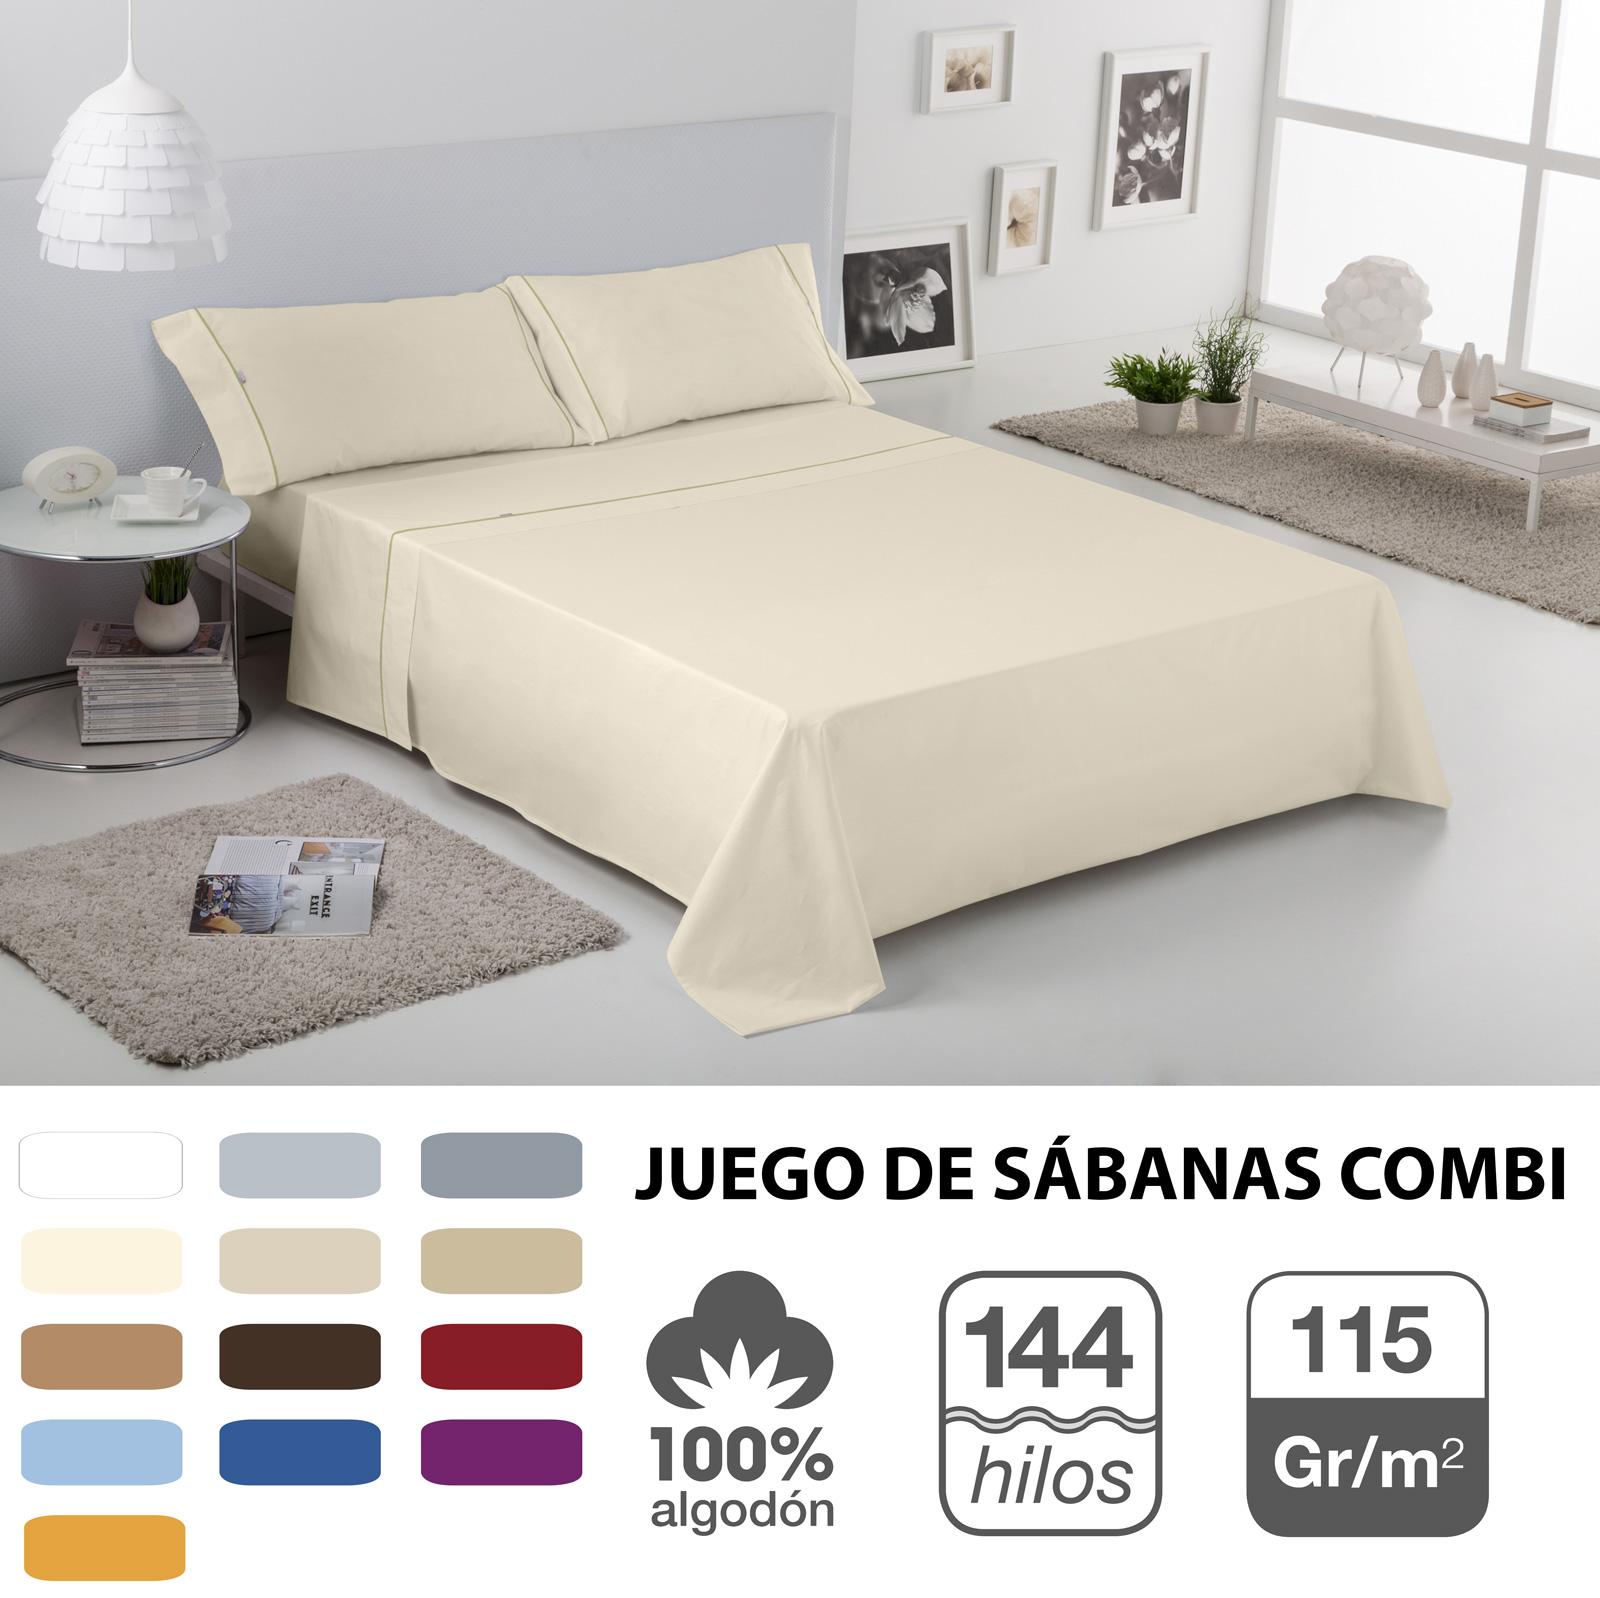 Ropa de cama zaragoza 46993 cama ideas - Ropa de cama zaragoza ...